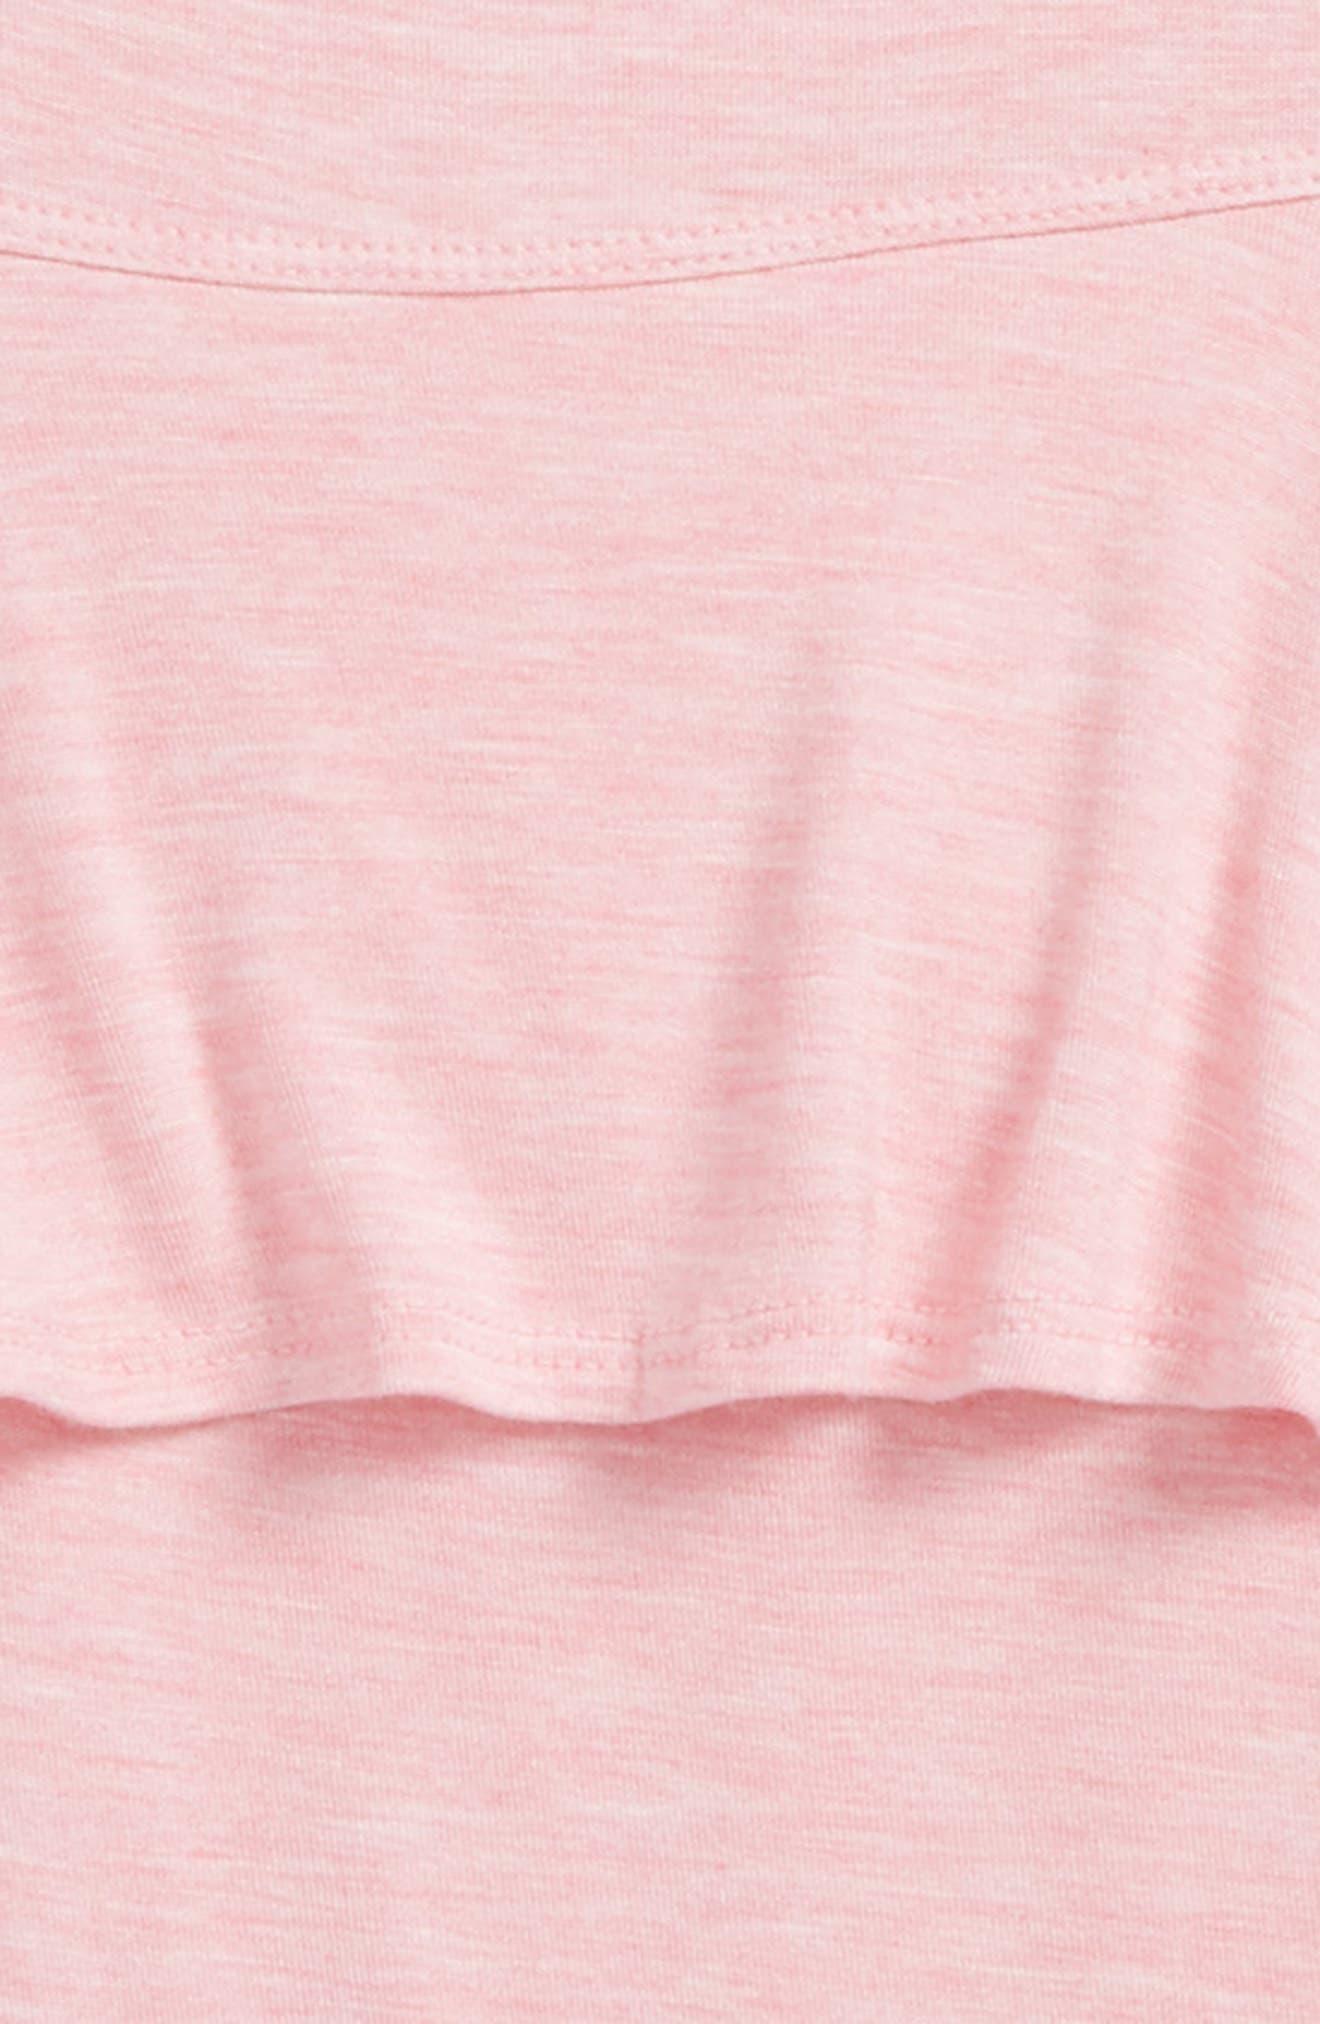 Cold Shoulder Tank,                             Alternate thumbnail 2, color,                             Pink Geranium Heather